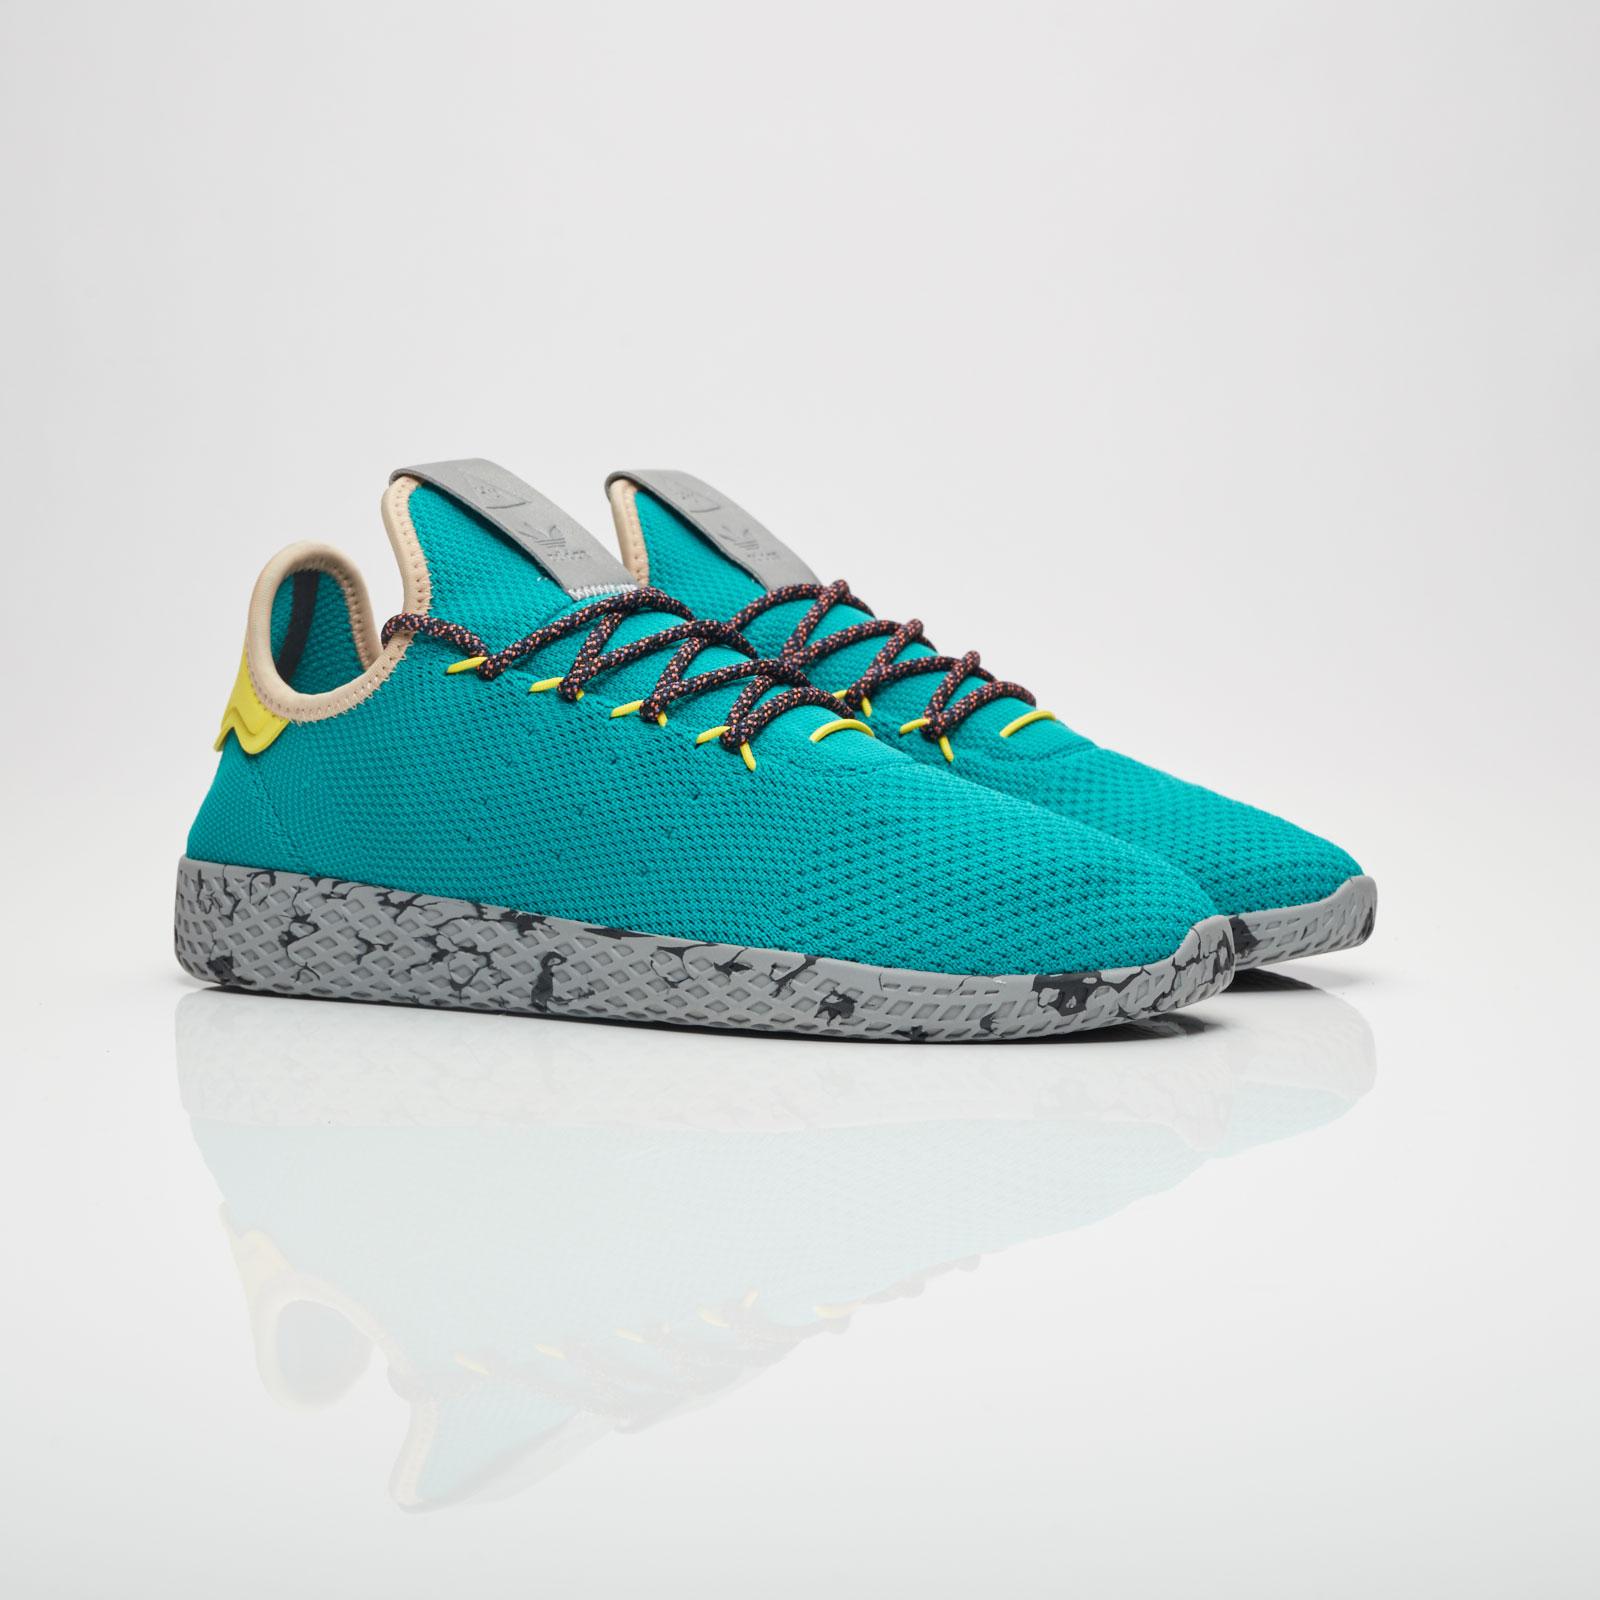 e04ad4146 adidas PW Tennis HU - Cq1872 - Sneakersnstuff